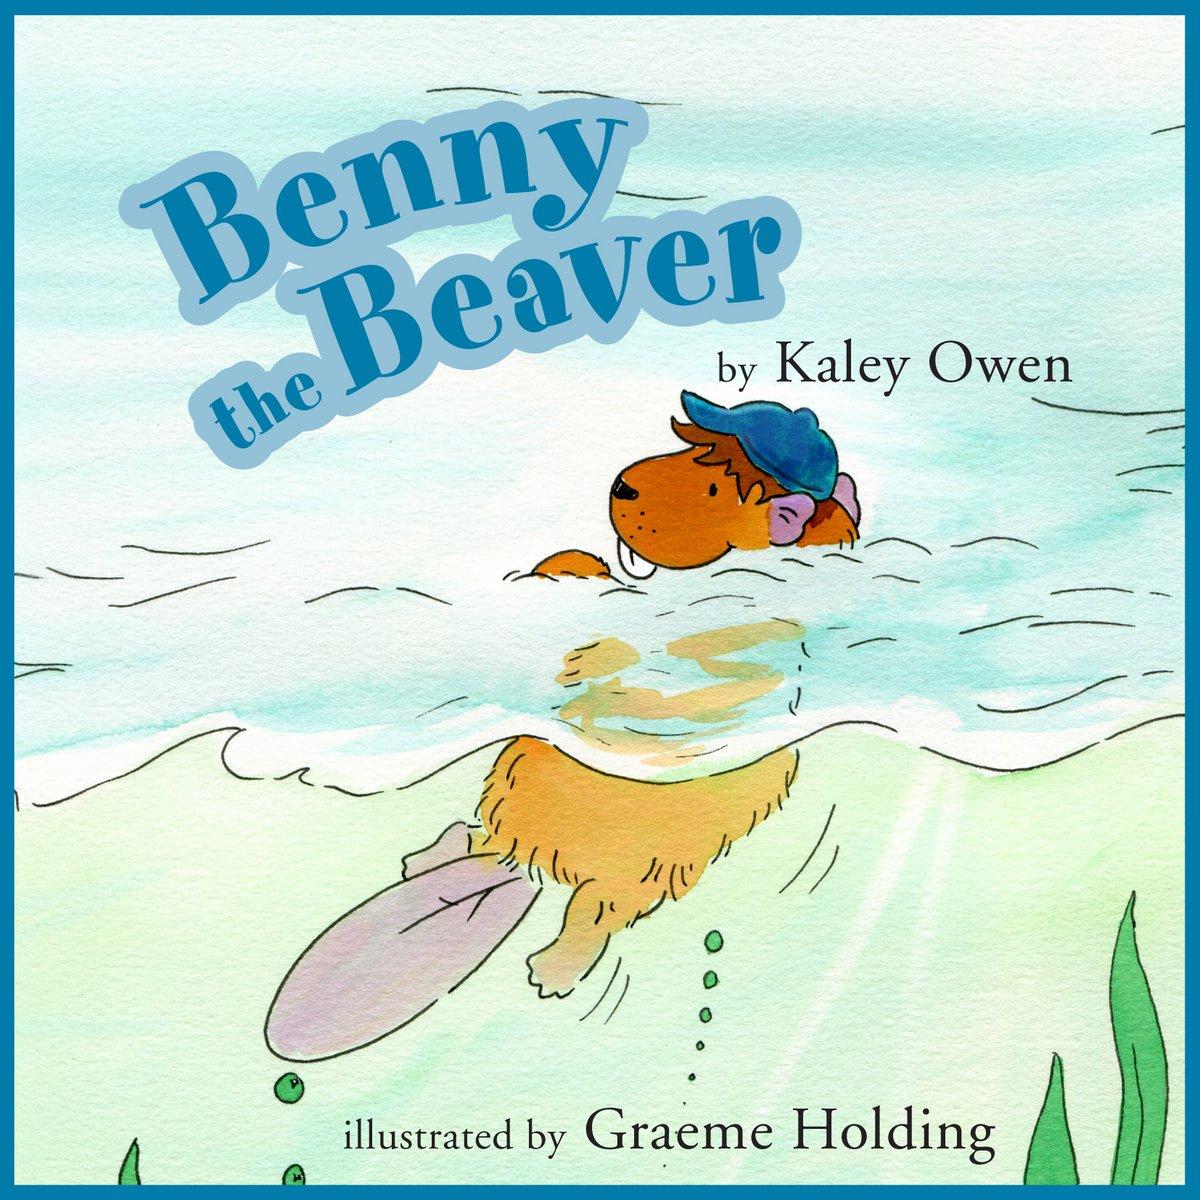 Benny the Beaver